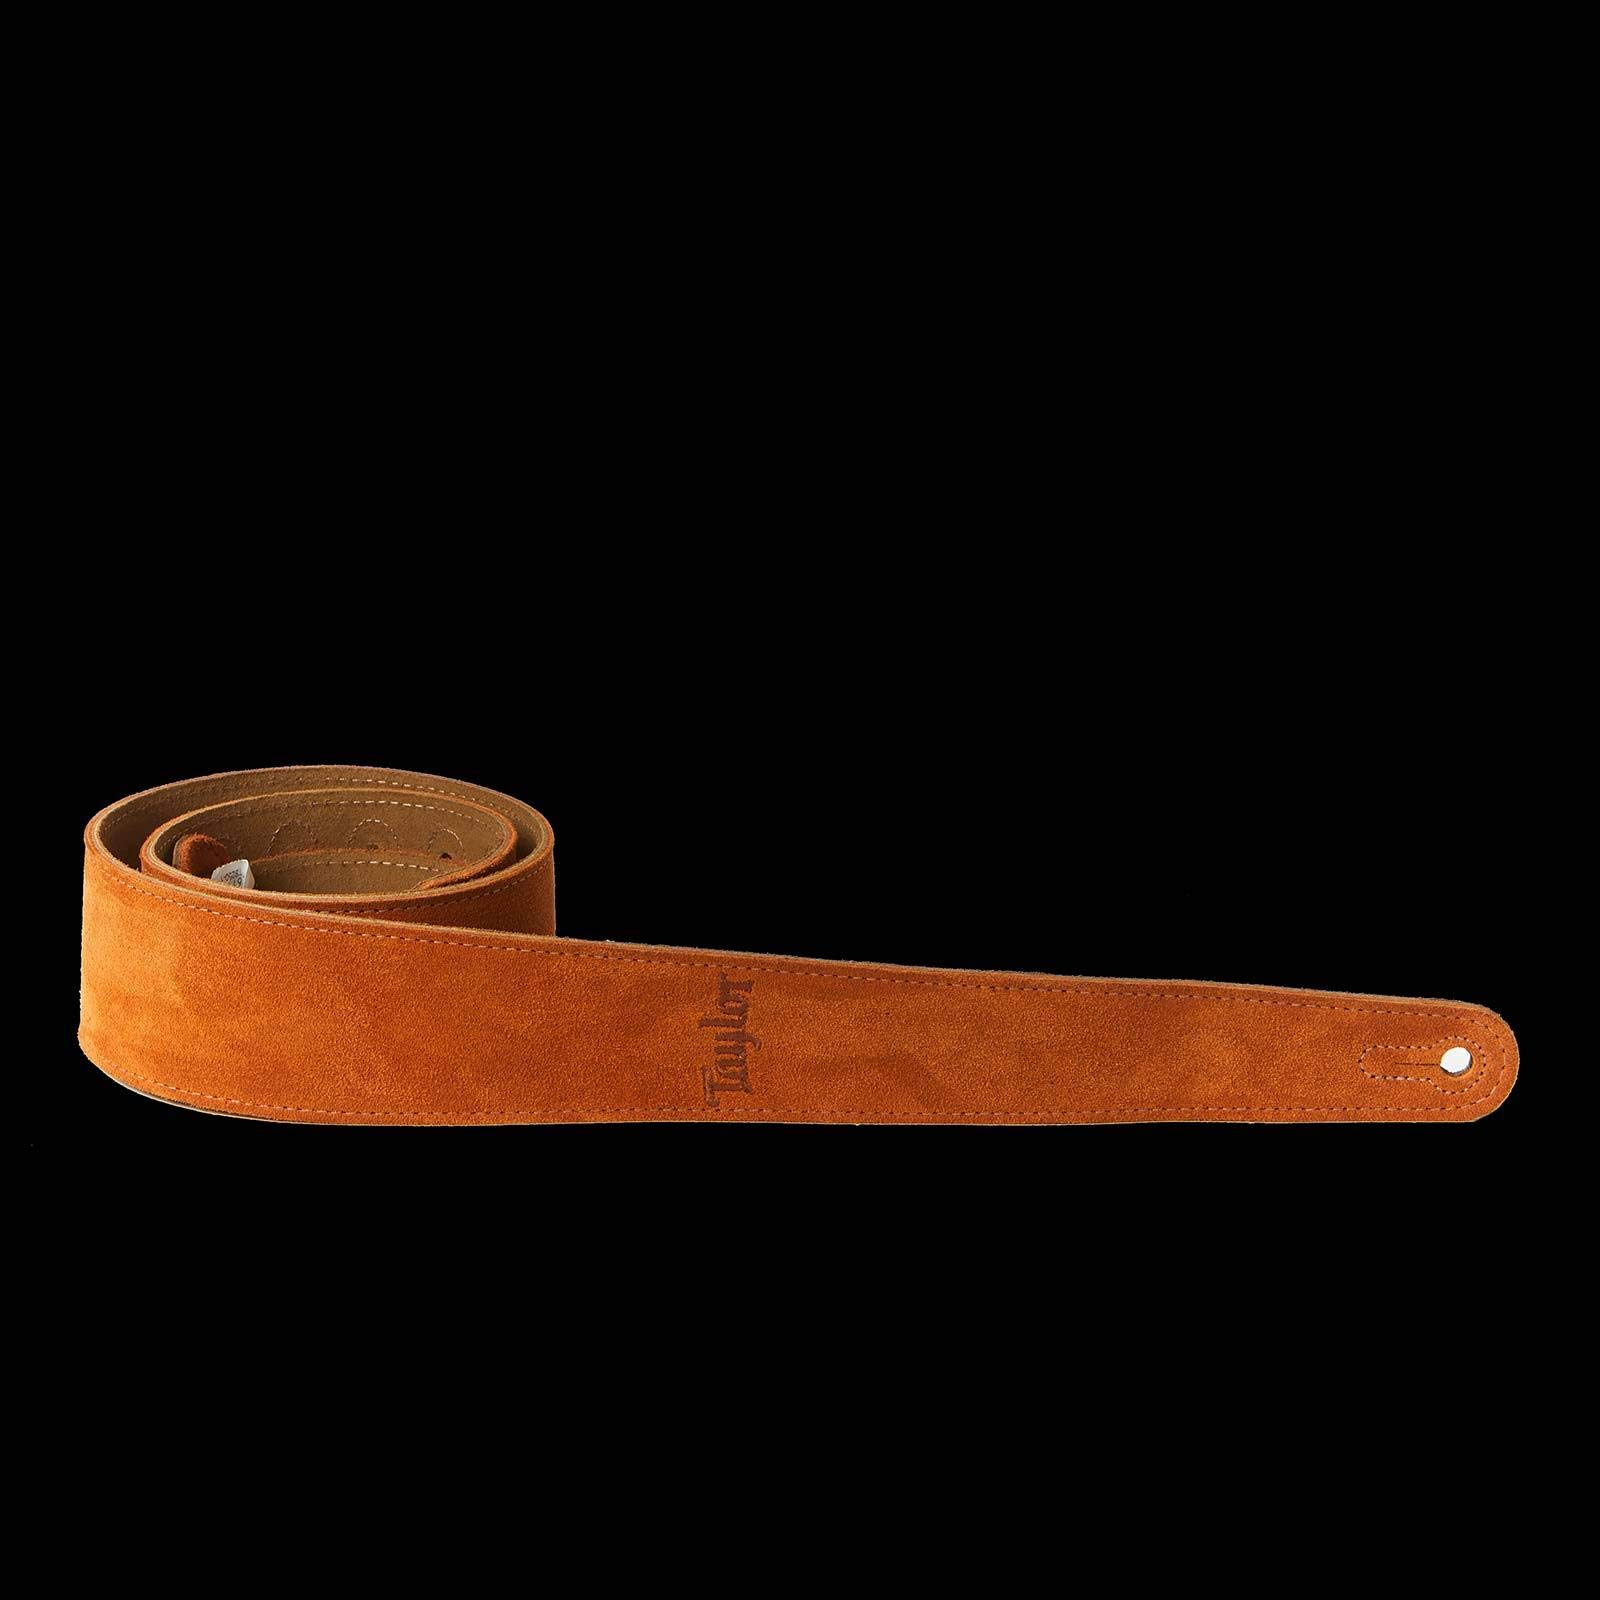 Taylor Guitars Suede Taylor Logo Guitar Strap (Honey) by Taylor Guitars